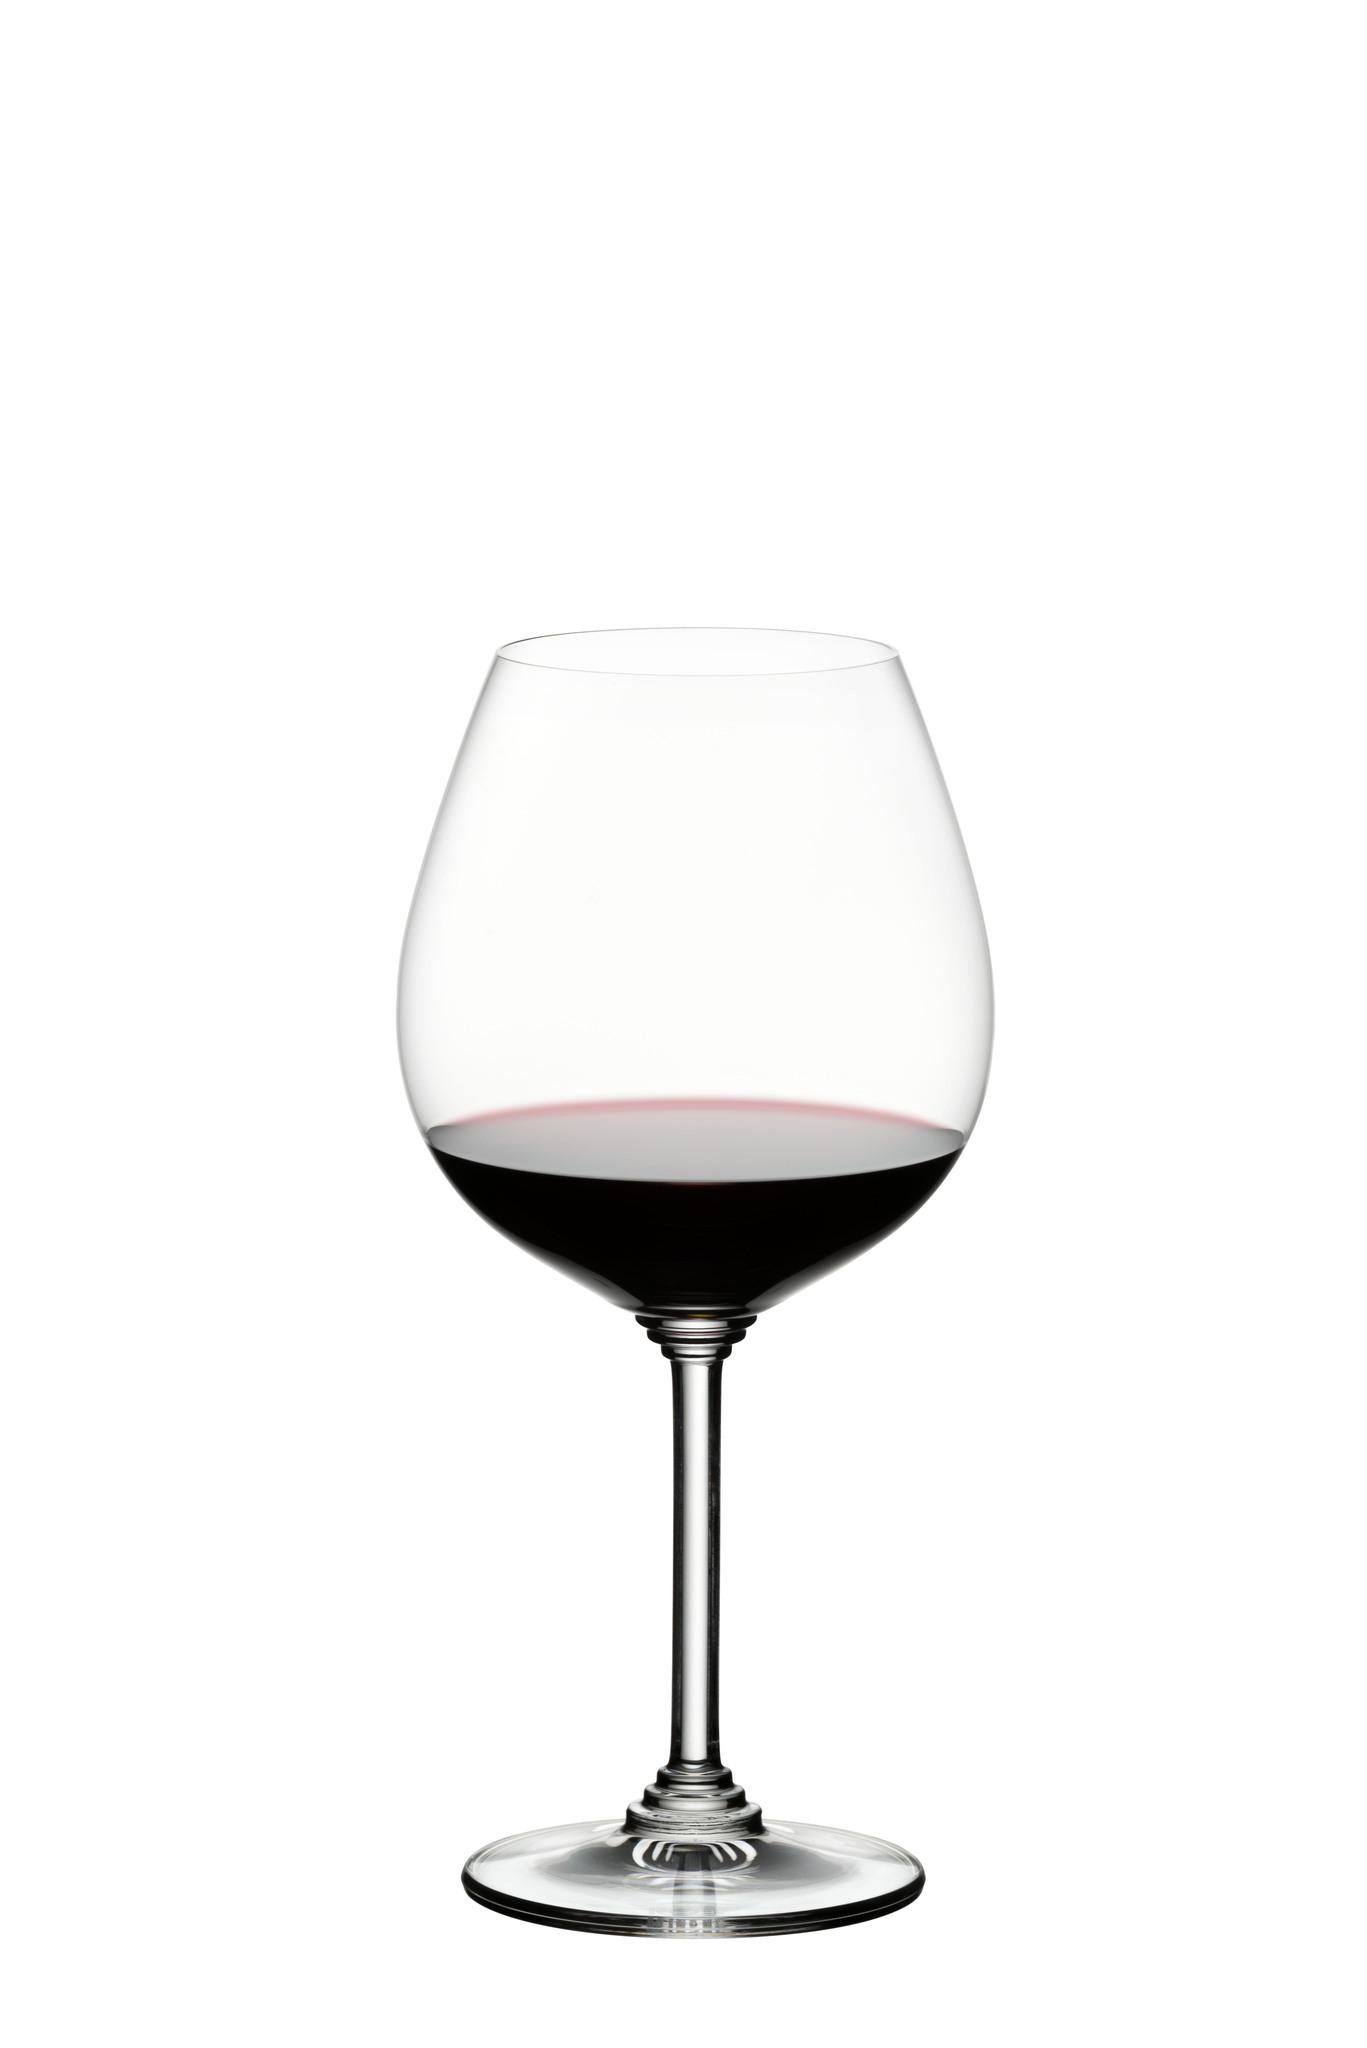 Бокалы Набор бокалов для красного вина 2шт 700мл Riedel Wine Pinot/Nebbiolo nabor-bokalov-dlya-krasnogo-vina-2-sht-700-ml-riedel-wine-pinotnebbiolo-avstriya.jpg